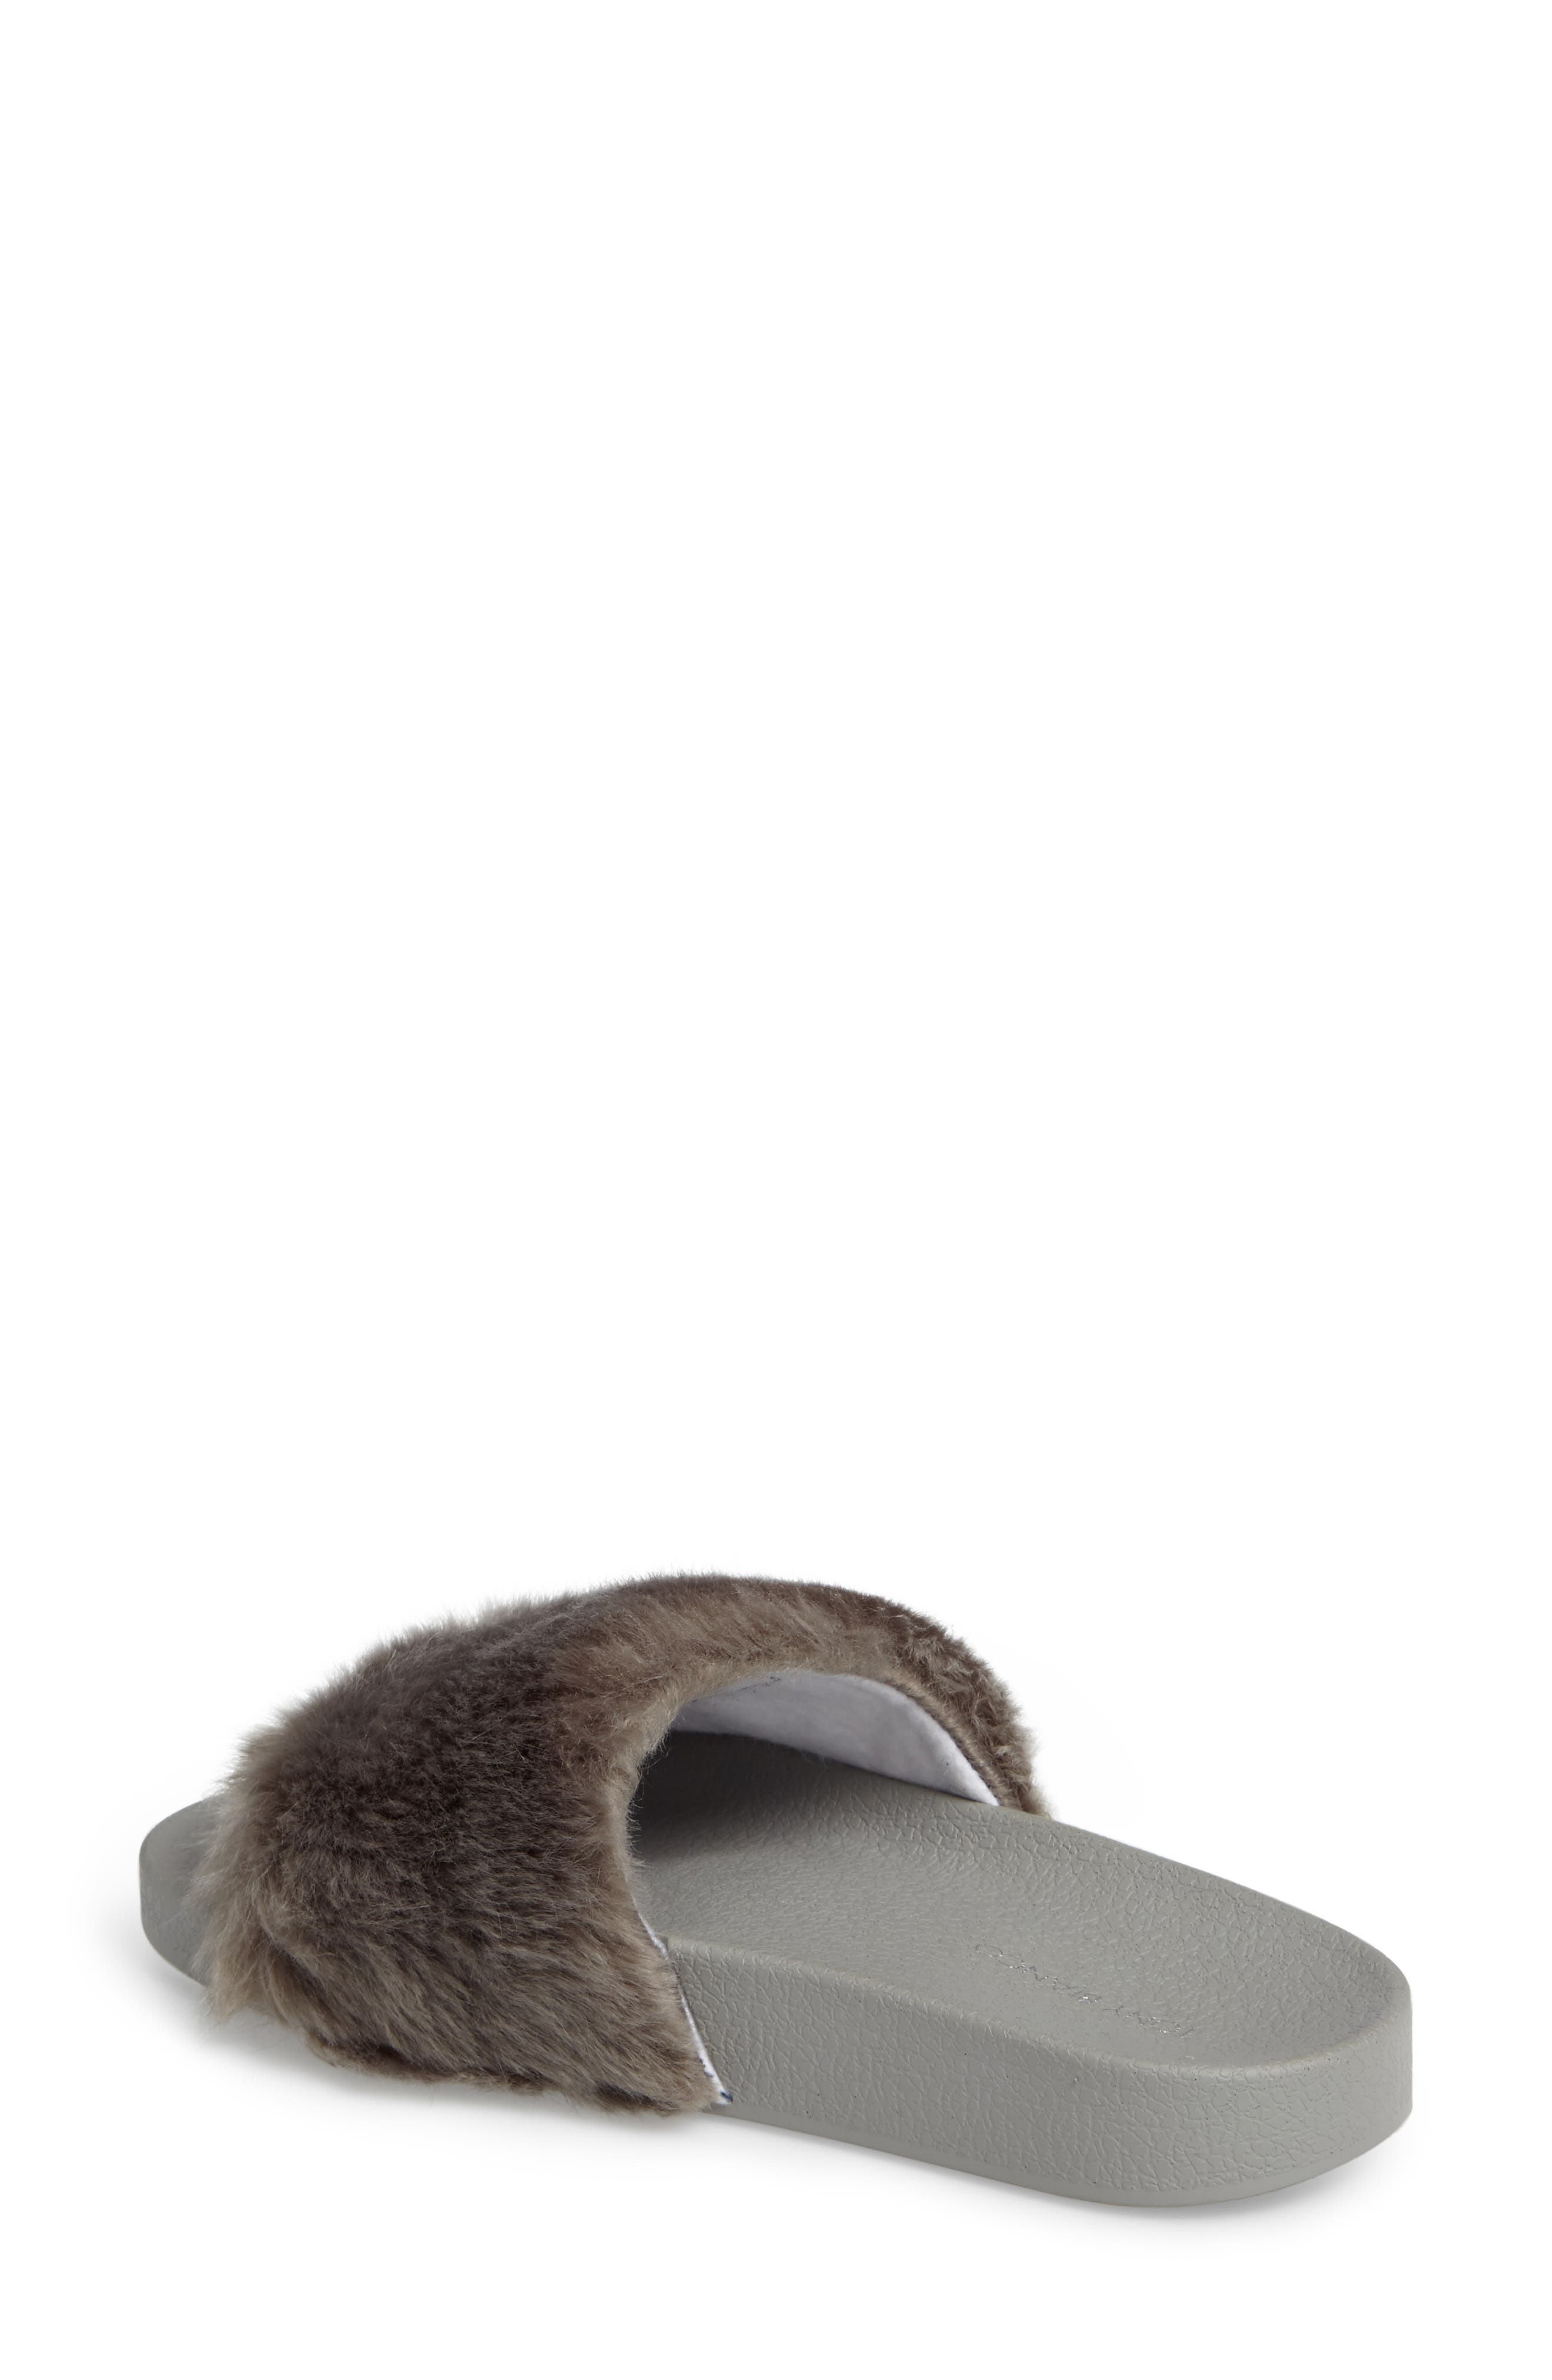 Vixen Slide Sandal,                             Alternate thumbnail 2, color,                             Grey Faux Fur